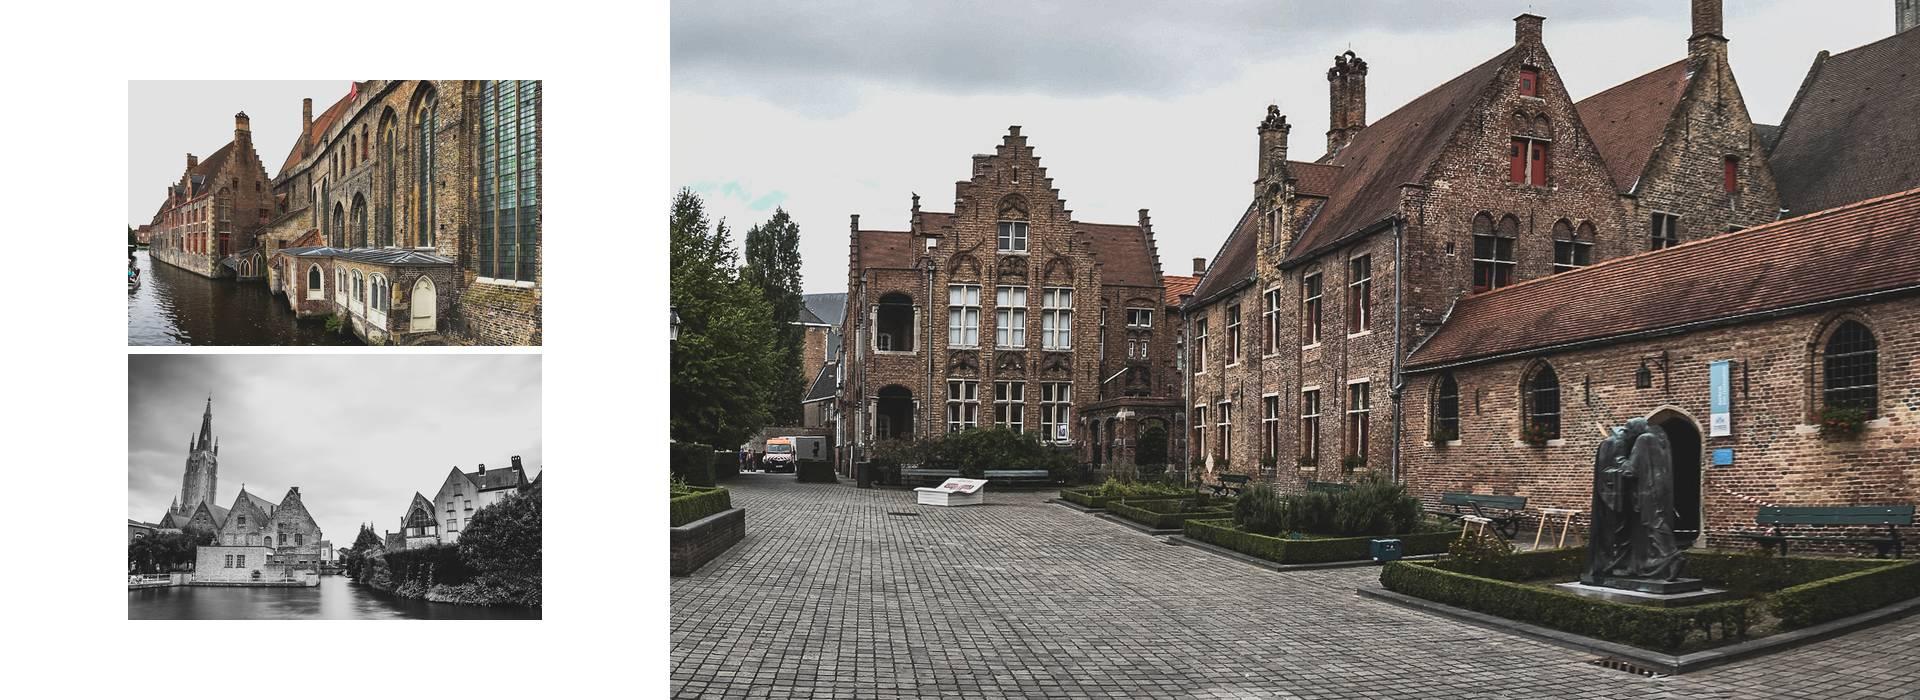 Live your Life - Brujas - Sint-Janshospitaal